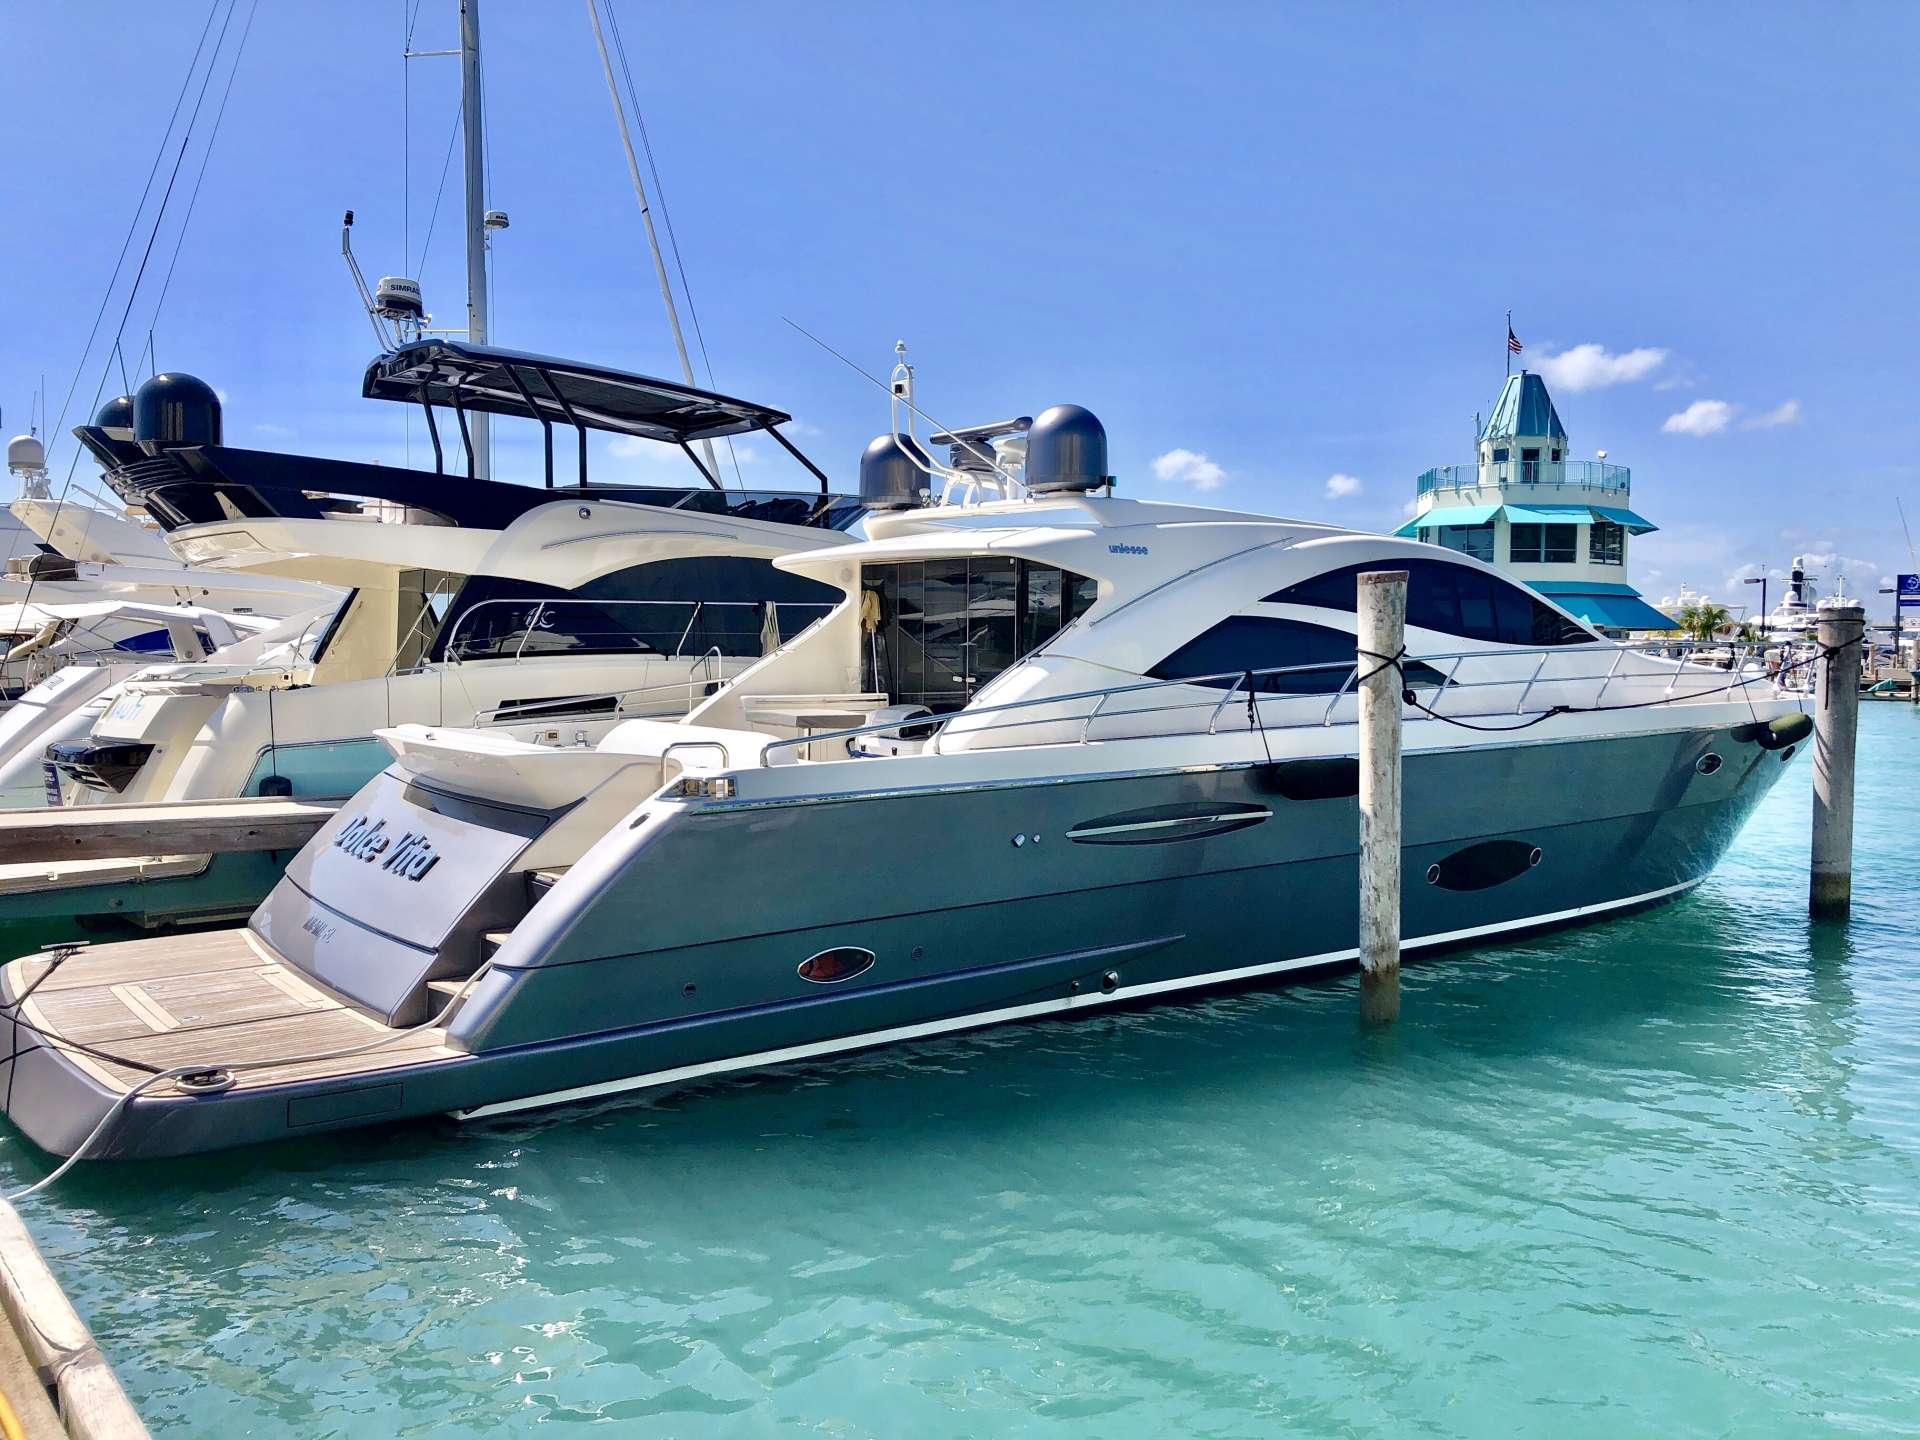 Power Yacht 'Power', 8 PAX, 2 Crew, 70.00 Ft, 21.00 Meters, Built 2008, ., Refit Year 2018